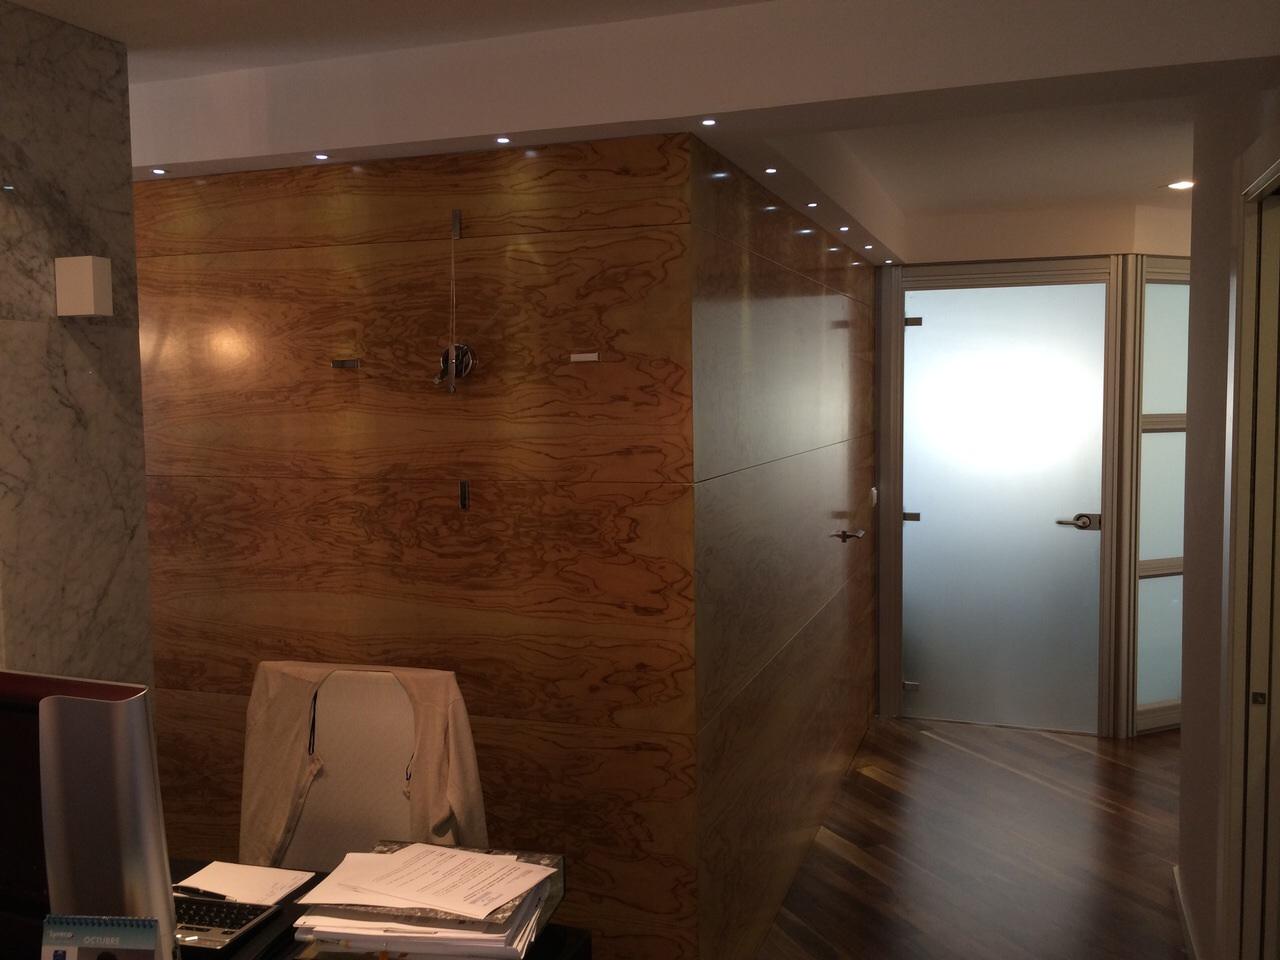 Decorador oficina valencia estudi31estudi31 for Master interiorismo valencia